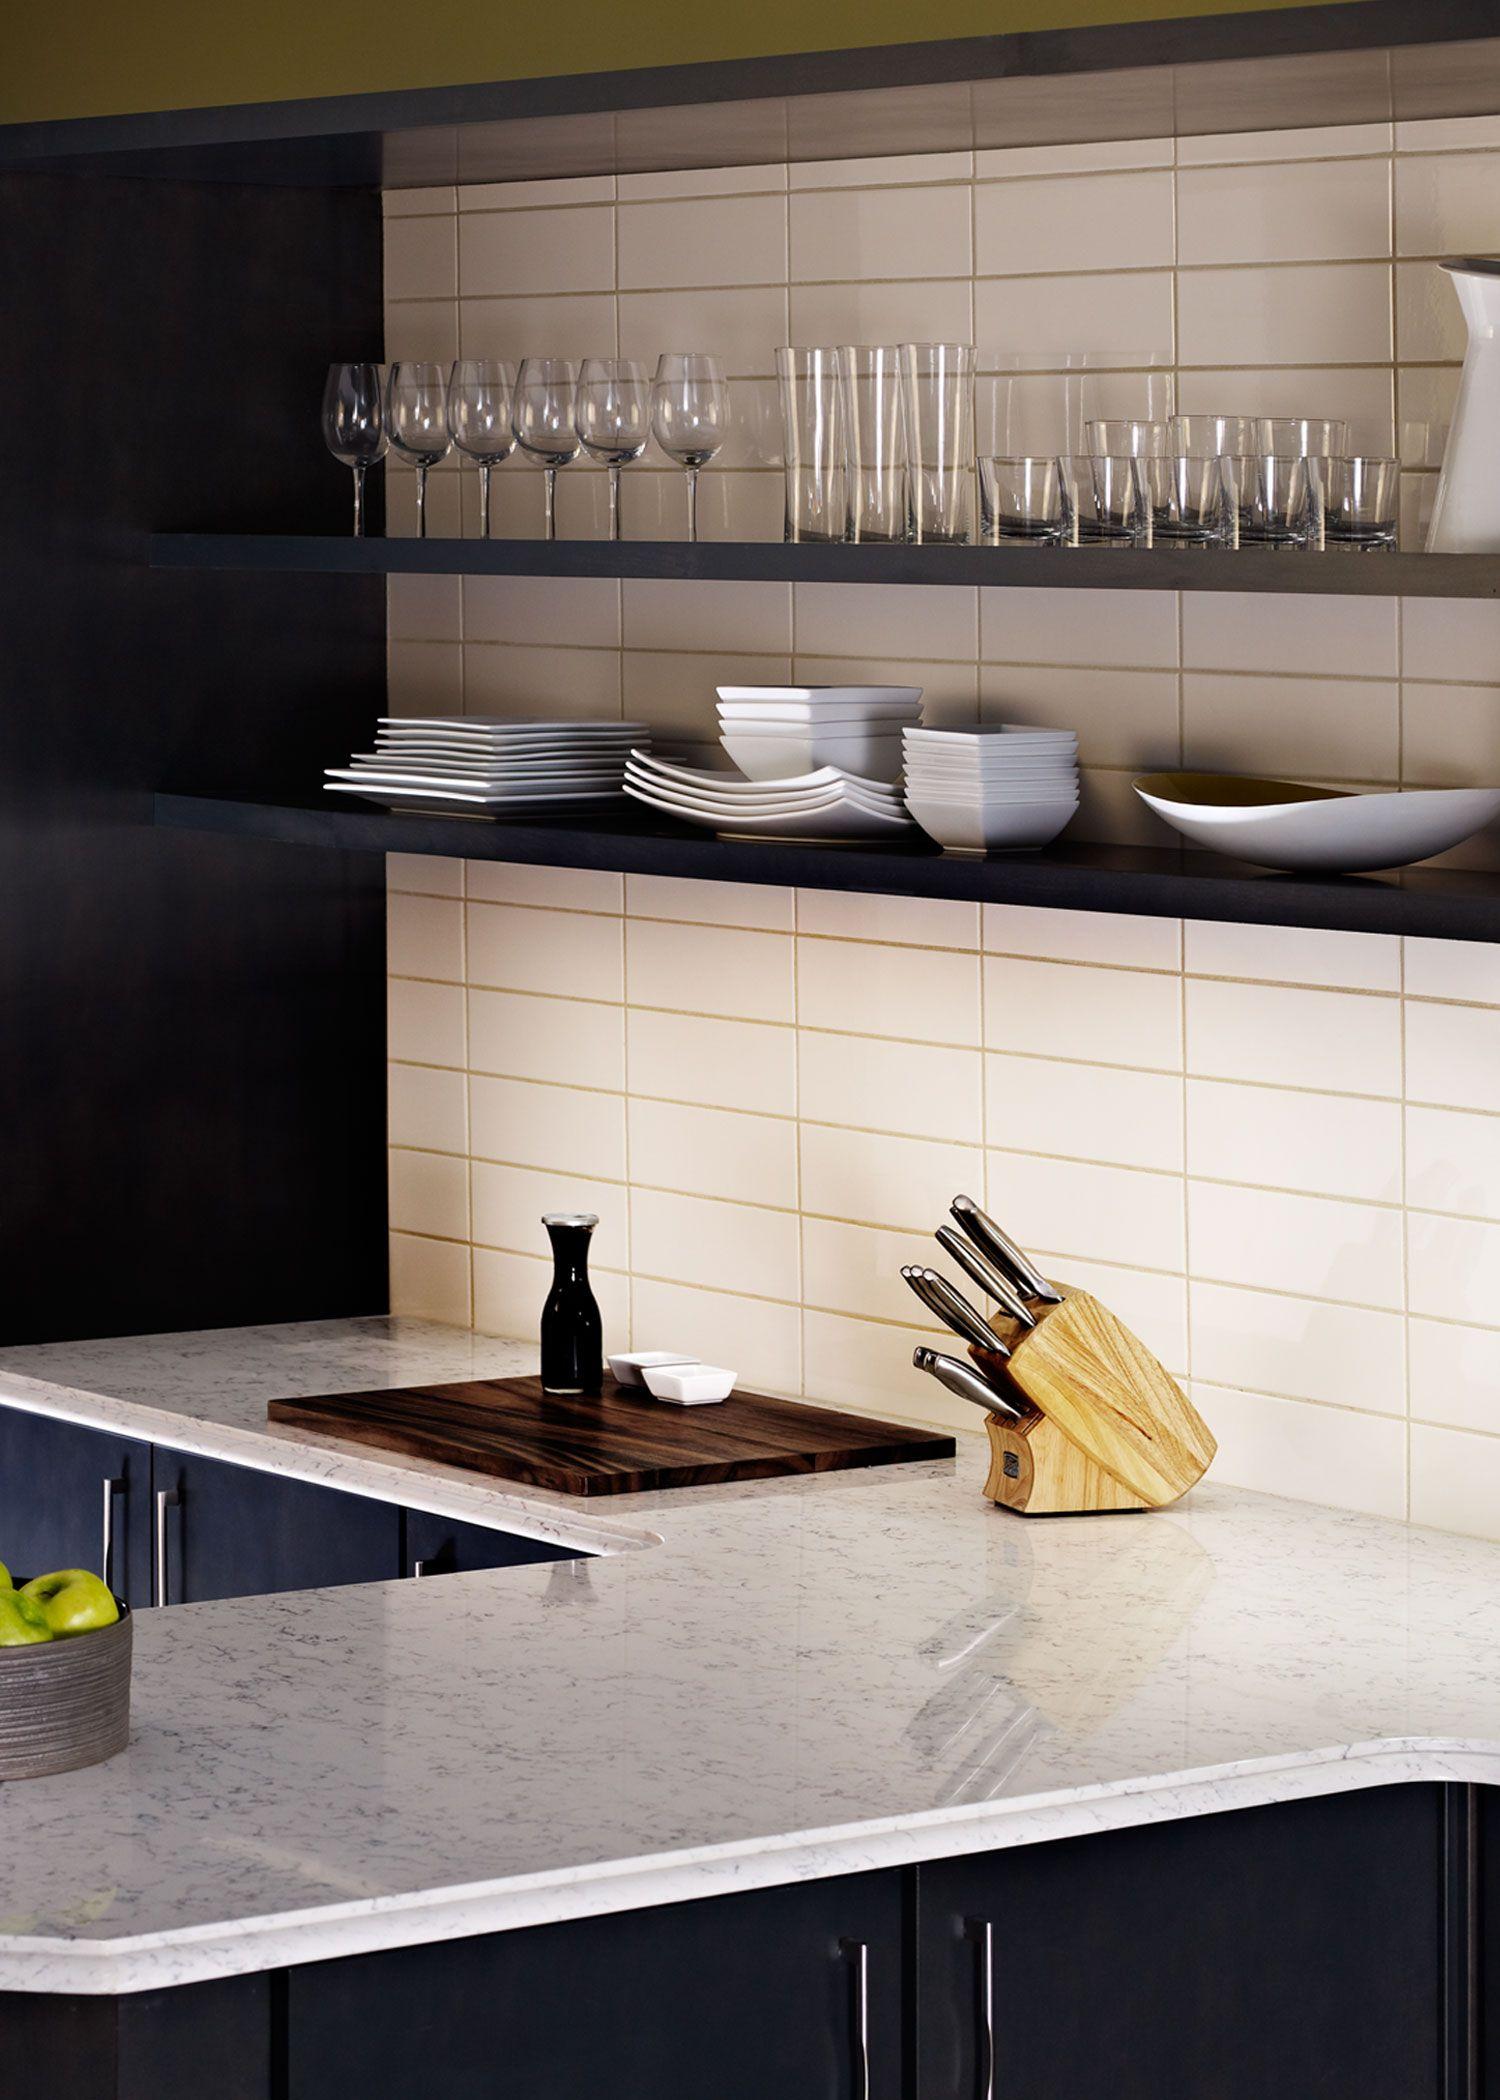 Unilume Led Slimline By Tech Lighting Lighting Kitchen